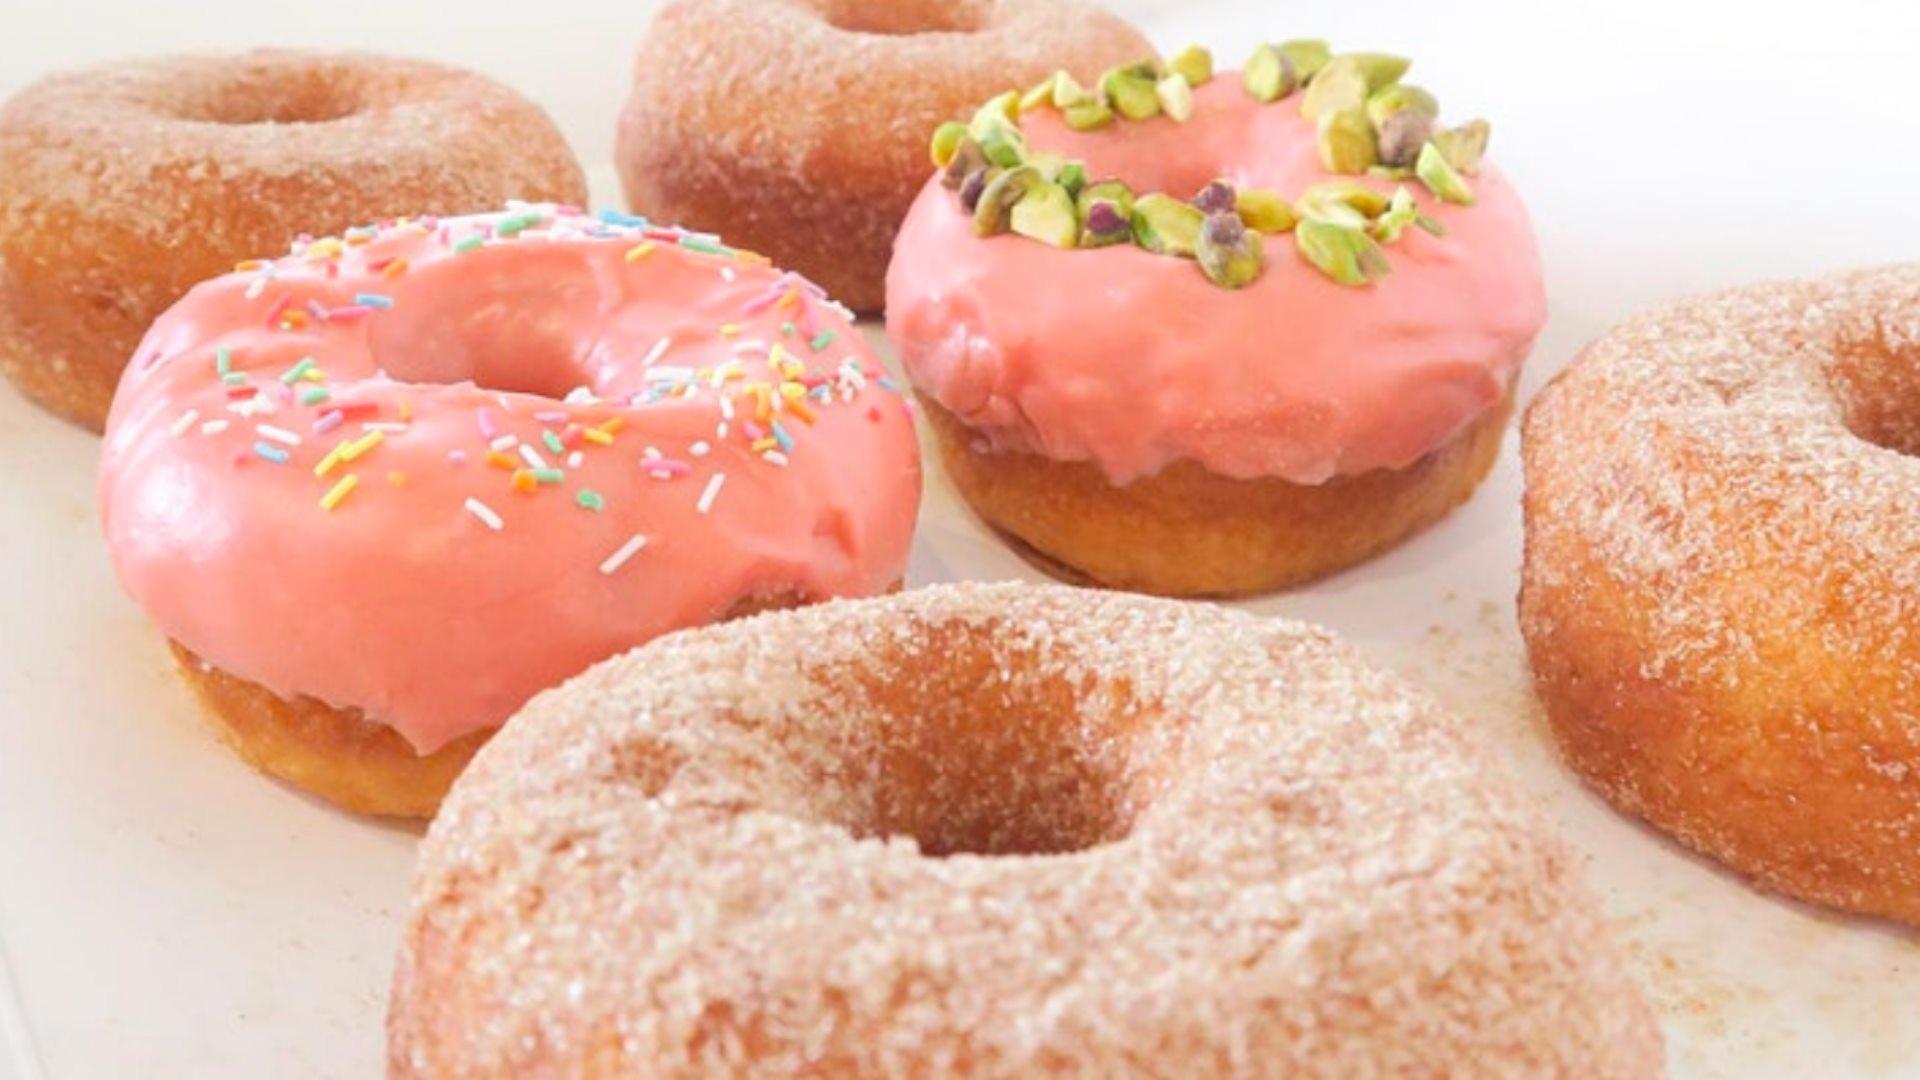 Doughheads' Vegan & Gluten Free Taste Testings